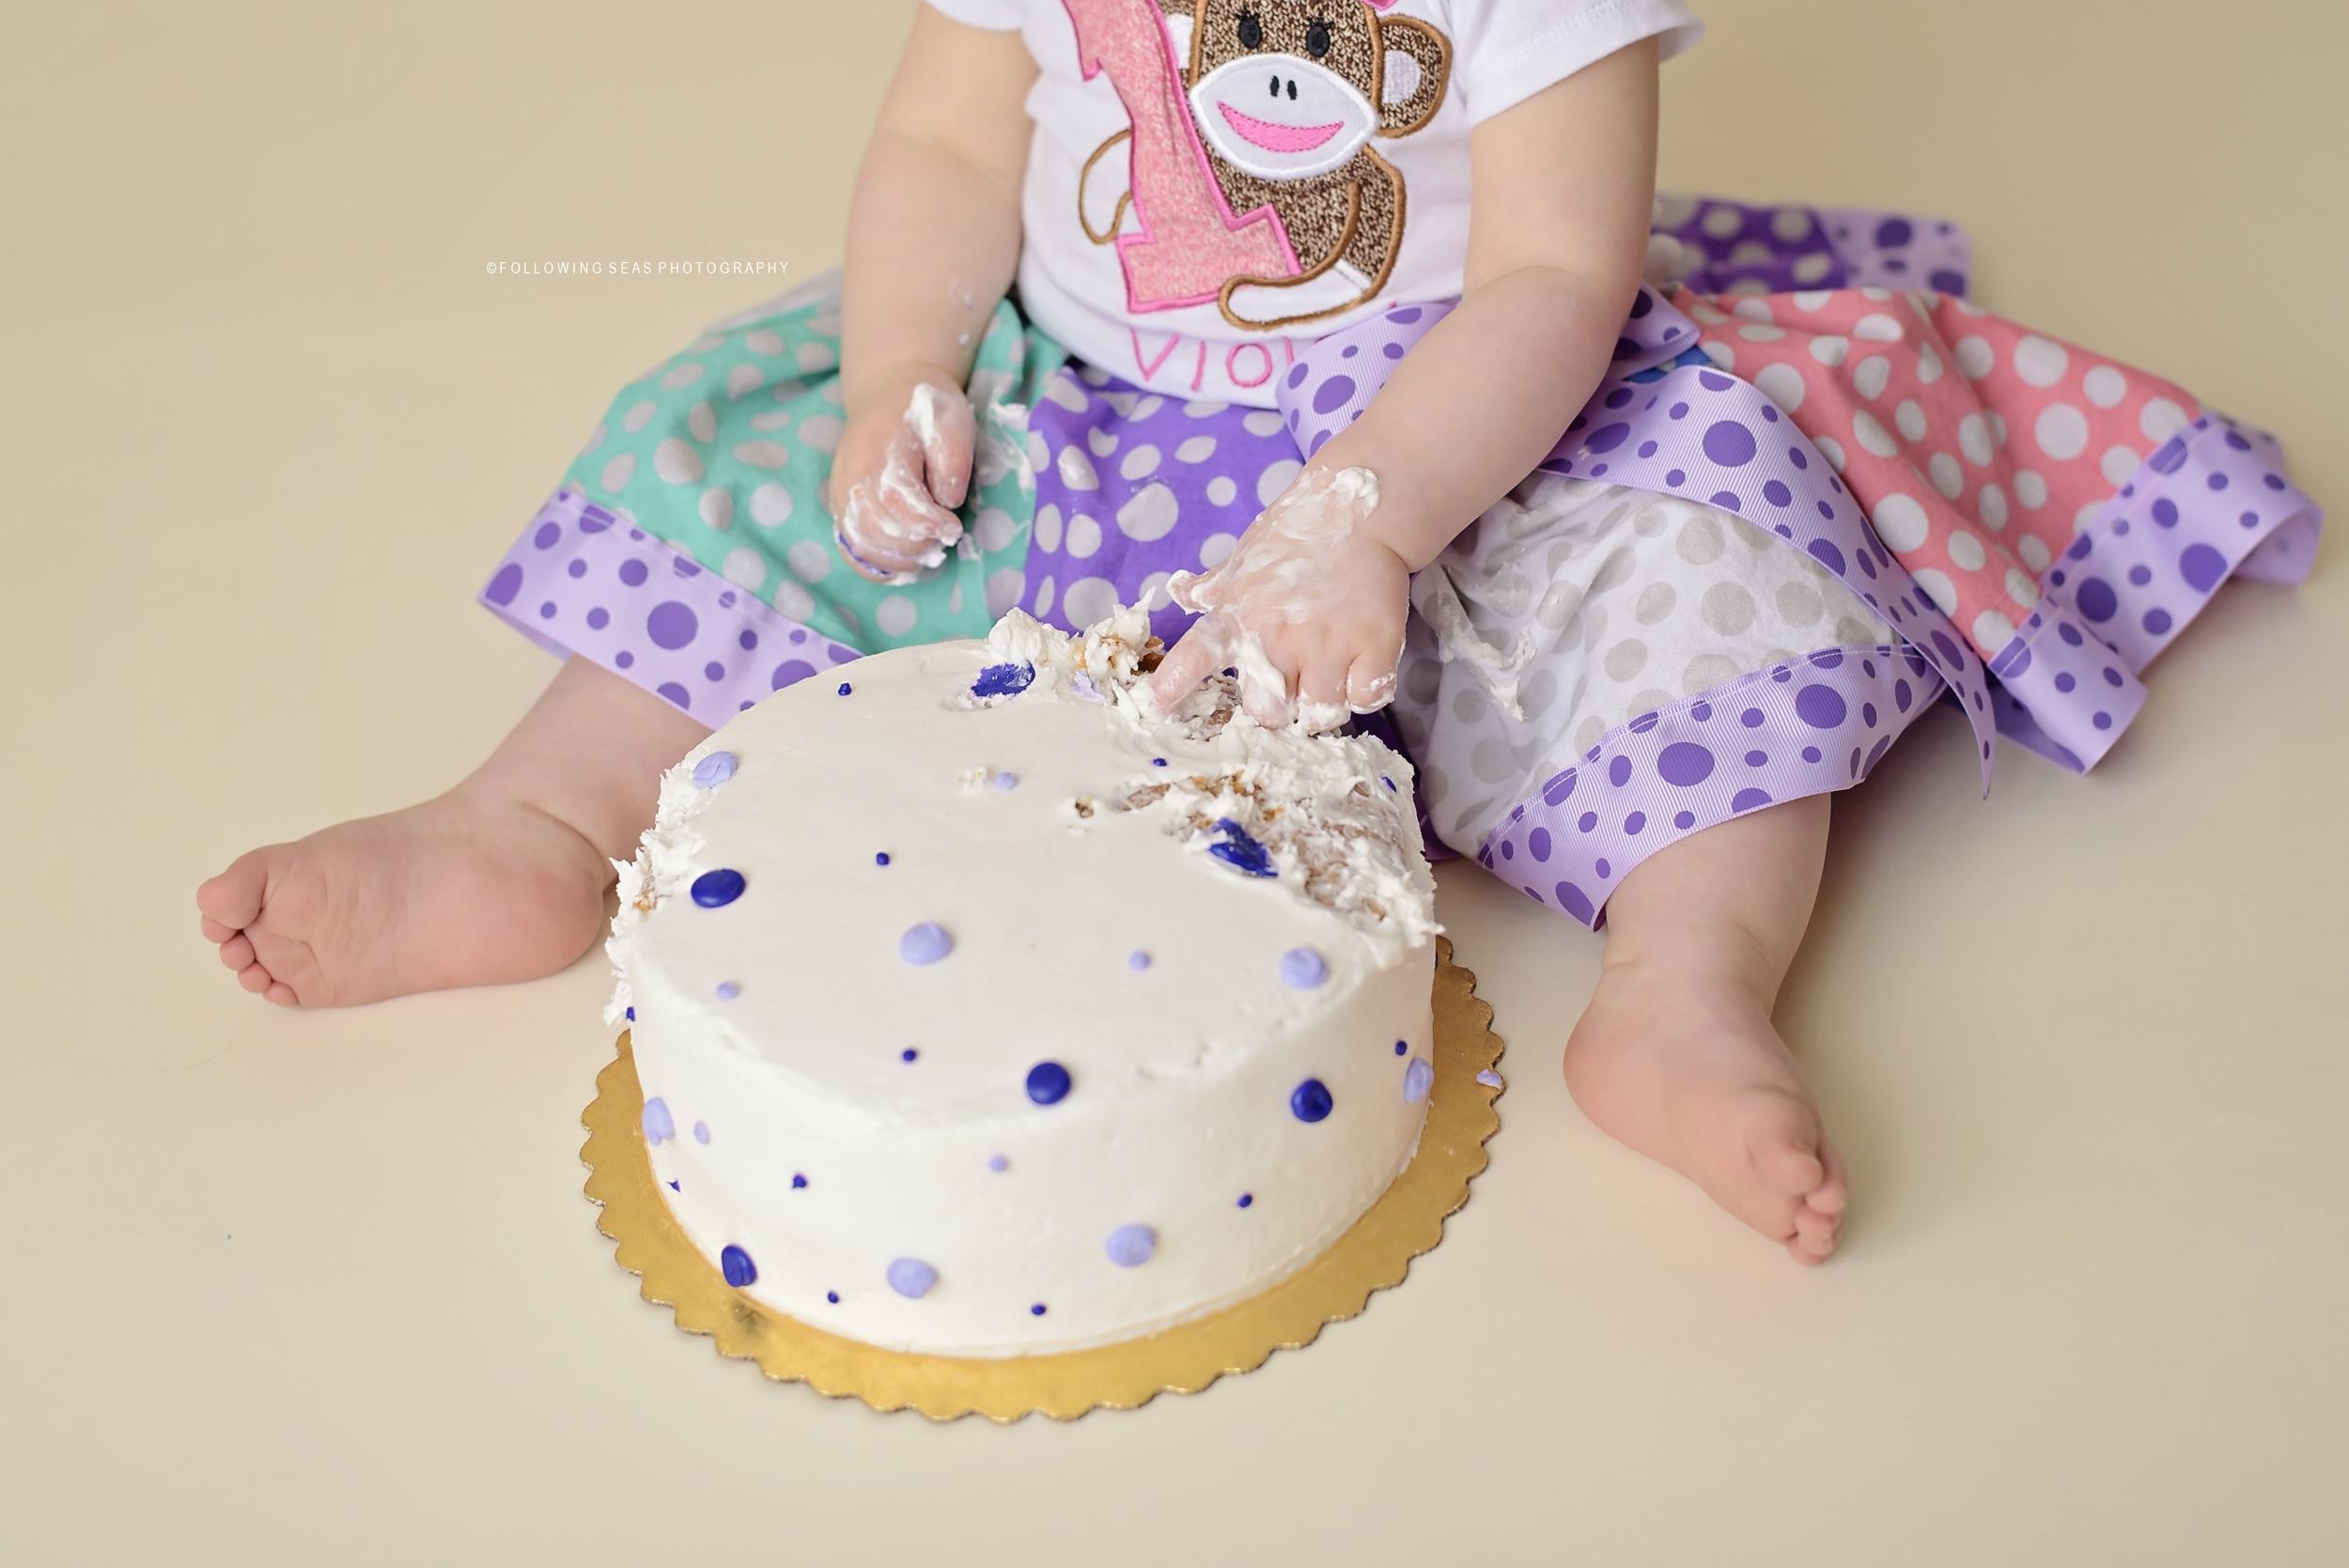 Bremerton Cake Smash Photographer-5089 copy.jpg